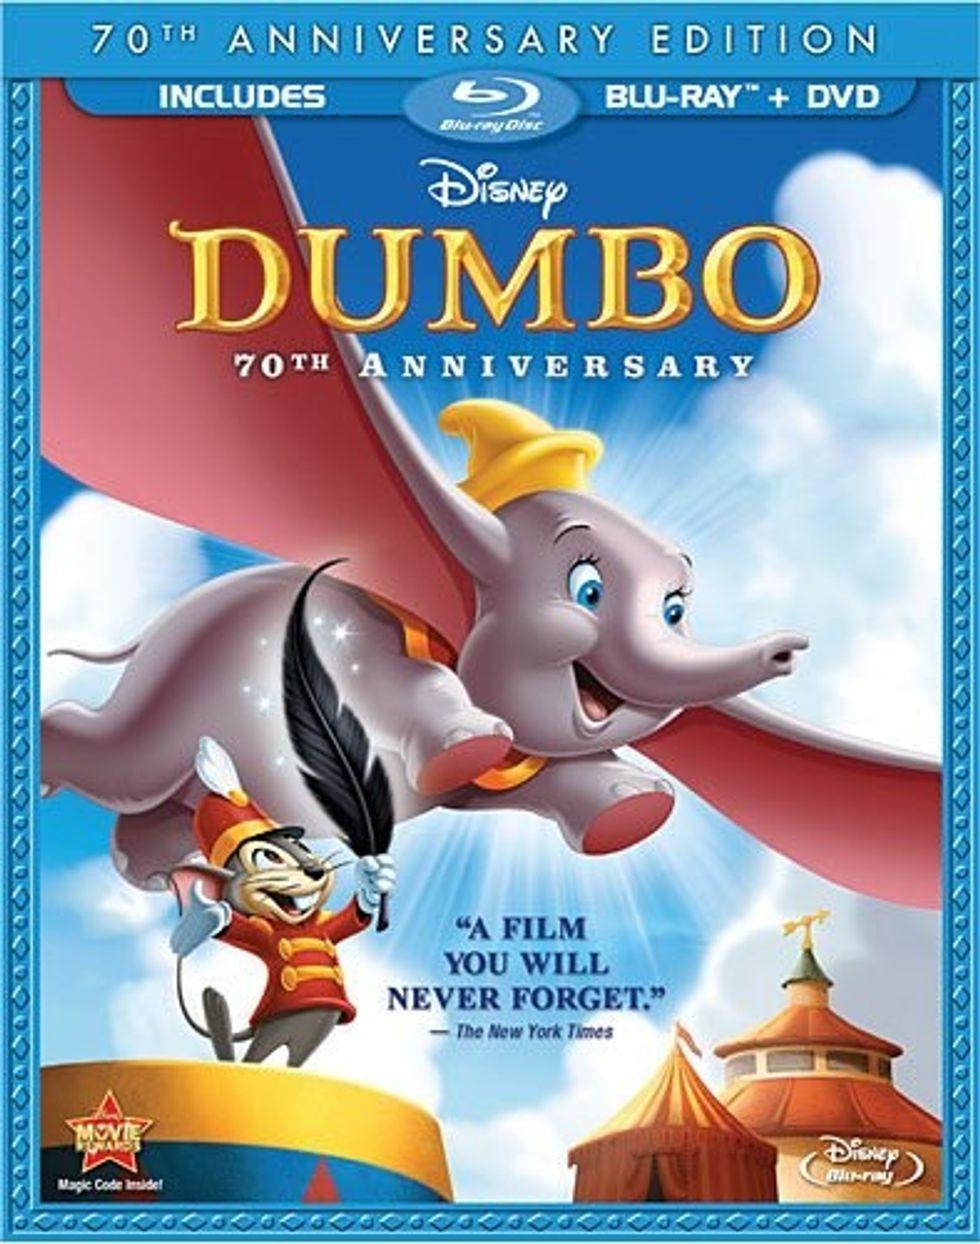 Disney's Dumbo + The Lion King On Blu-ray